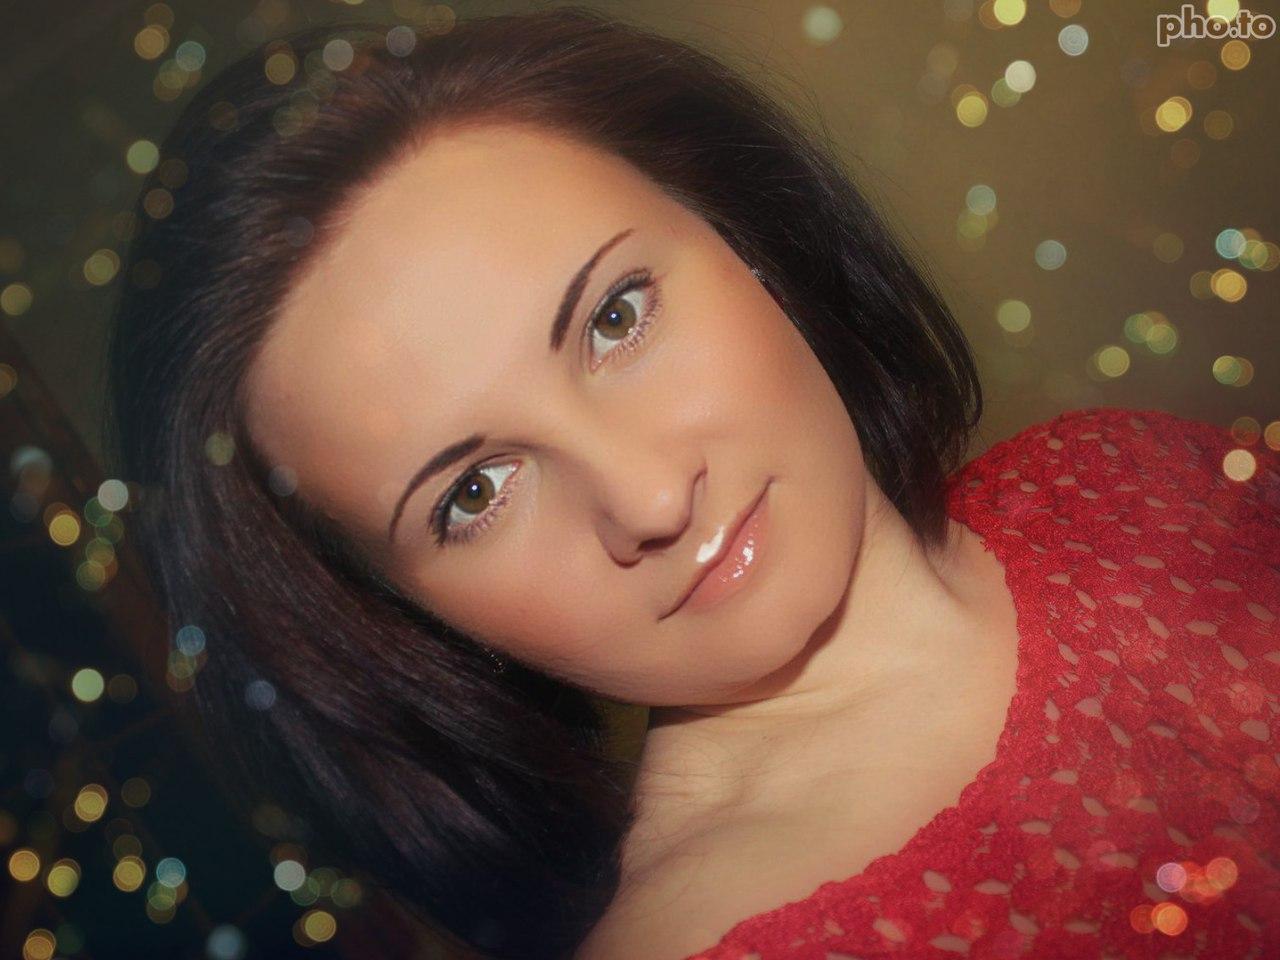 Лолли Твердаева, Одесса - фото №1